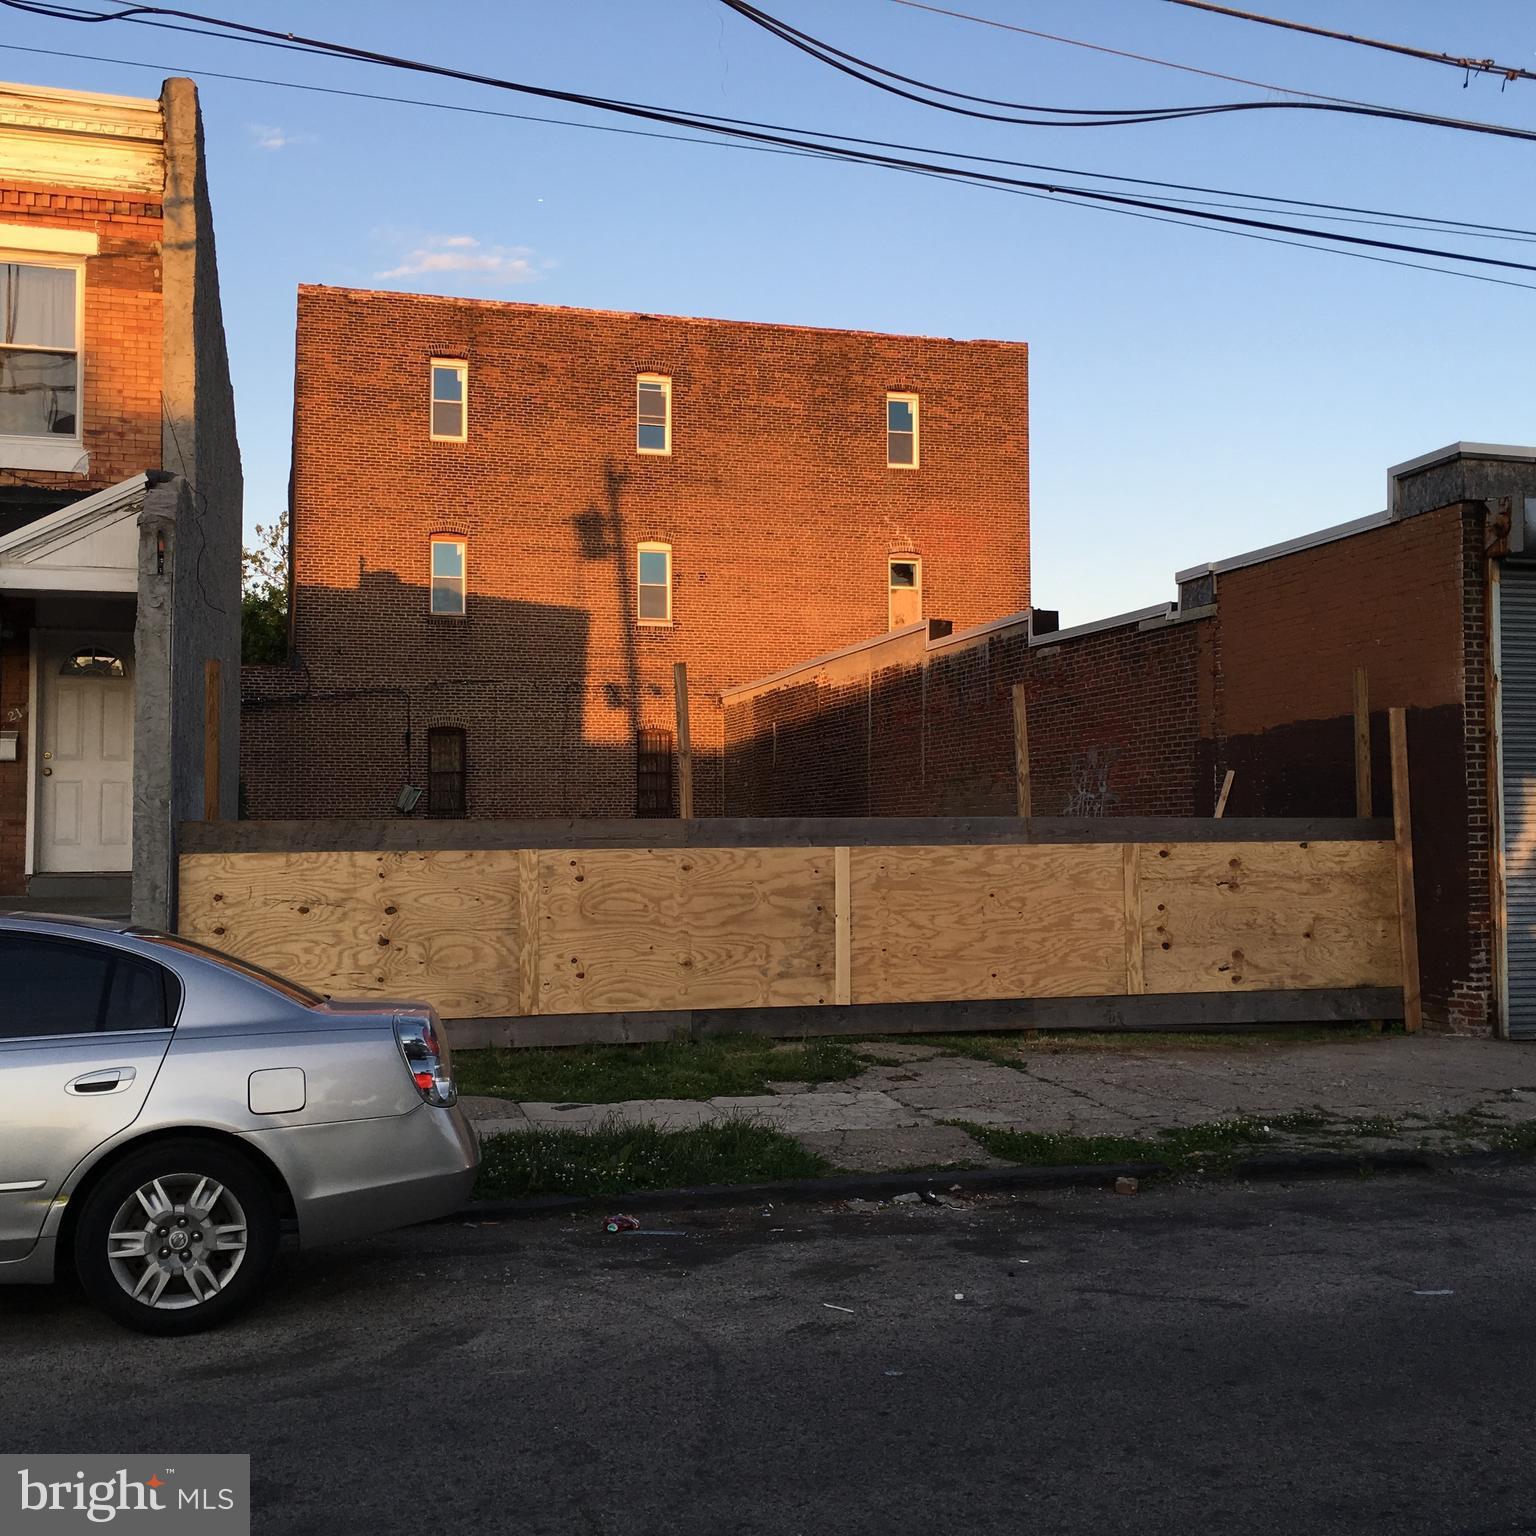 15 N 59TH STREET, PHILADELPHIA, PA 19139